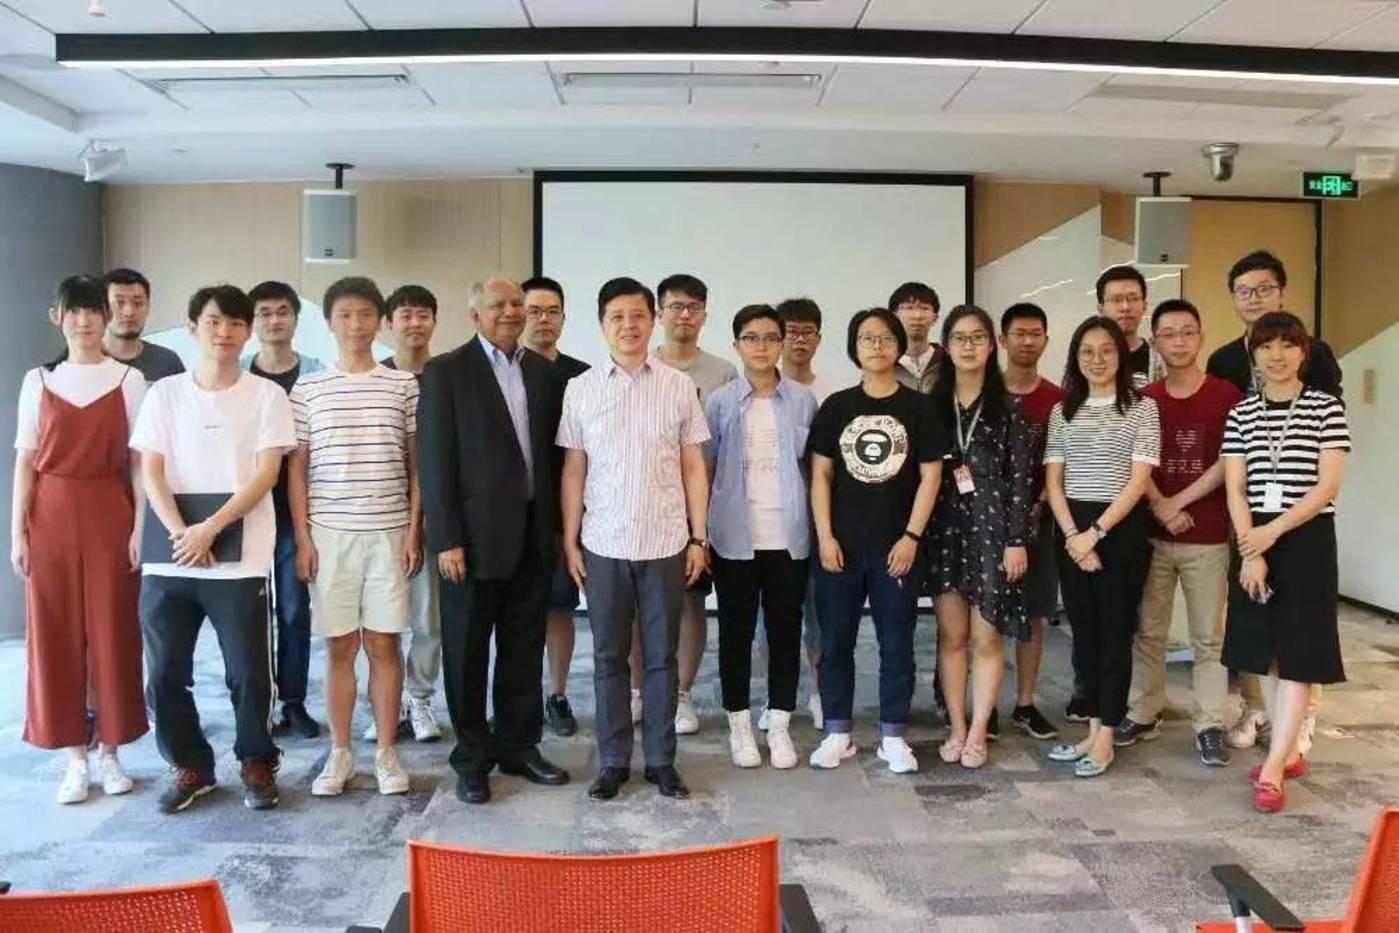 Raj Reddy(前排左四)与微软亚洲研究院院长洪小文(前排左五)以及学生合影